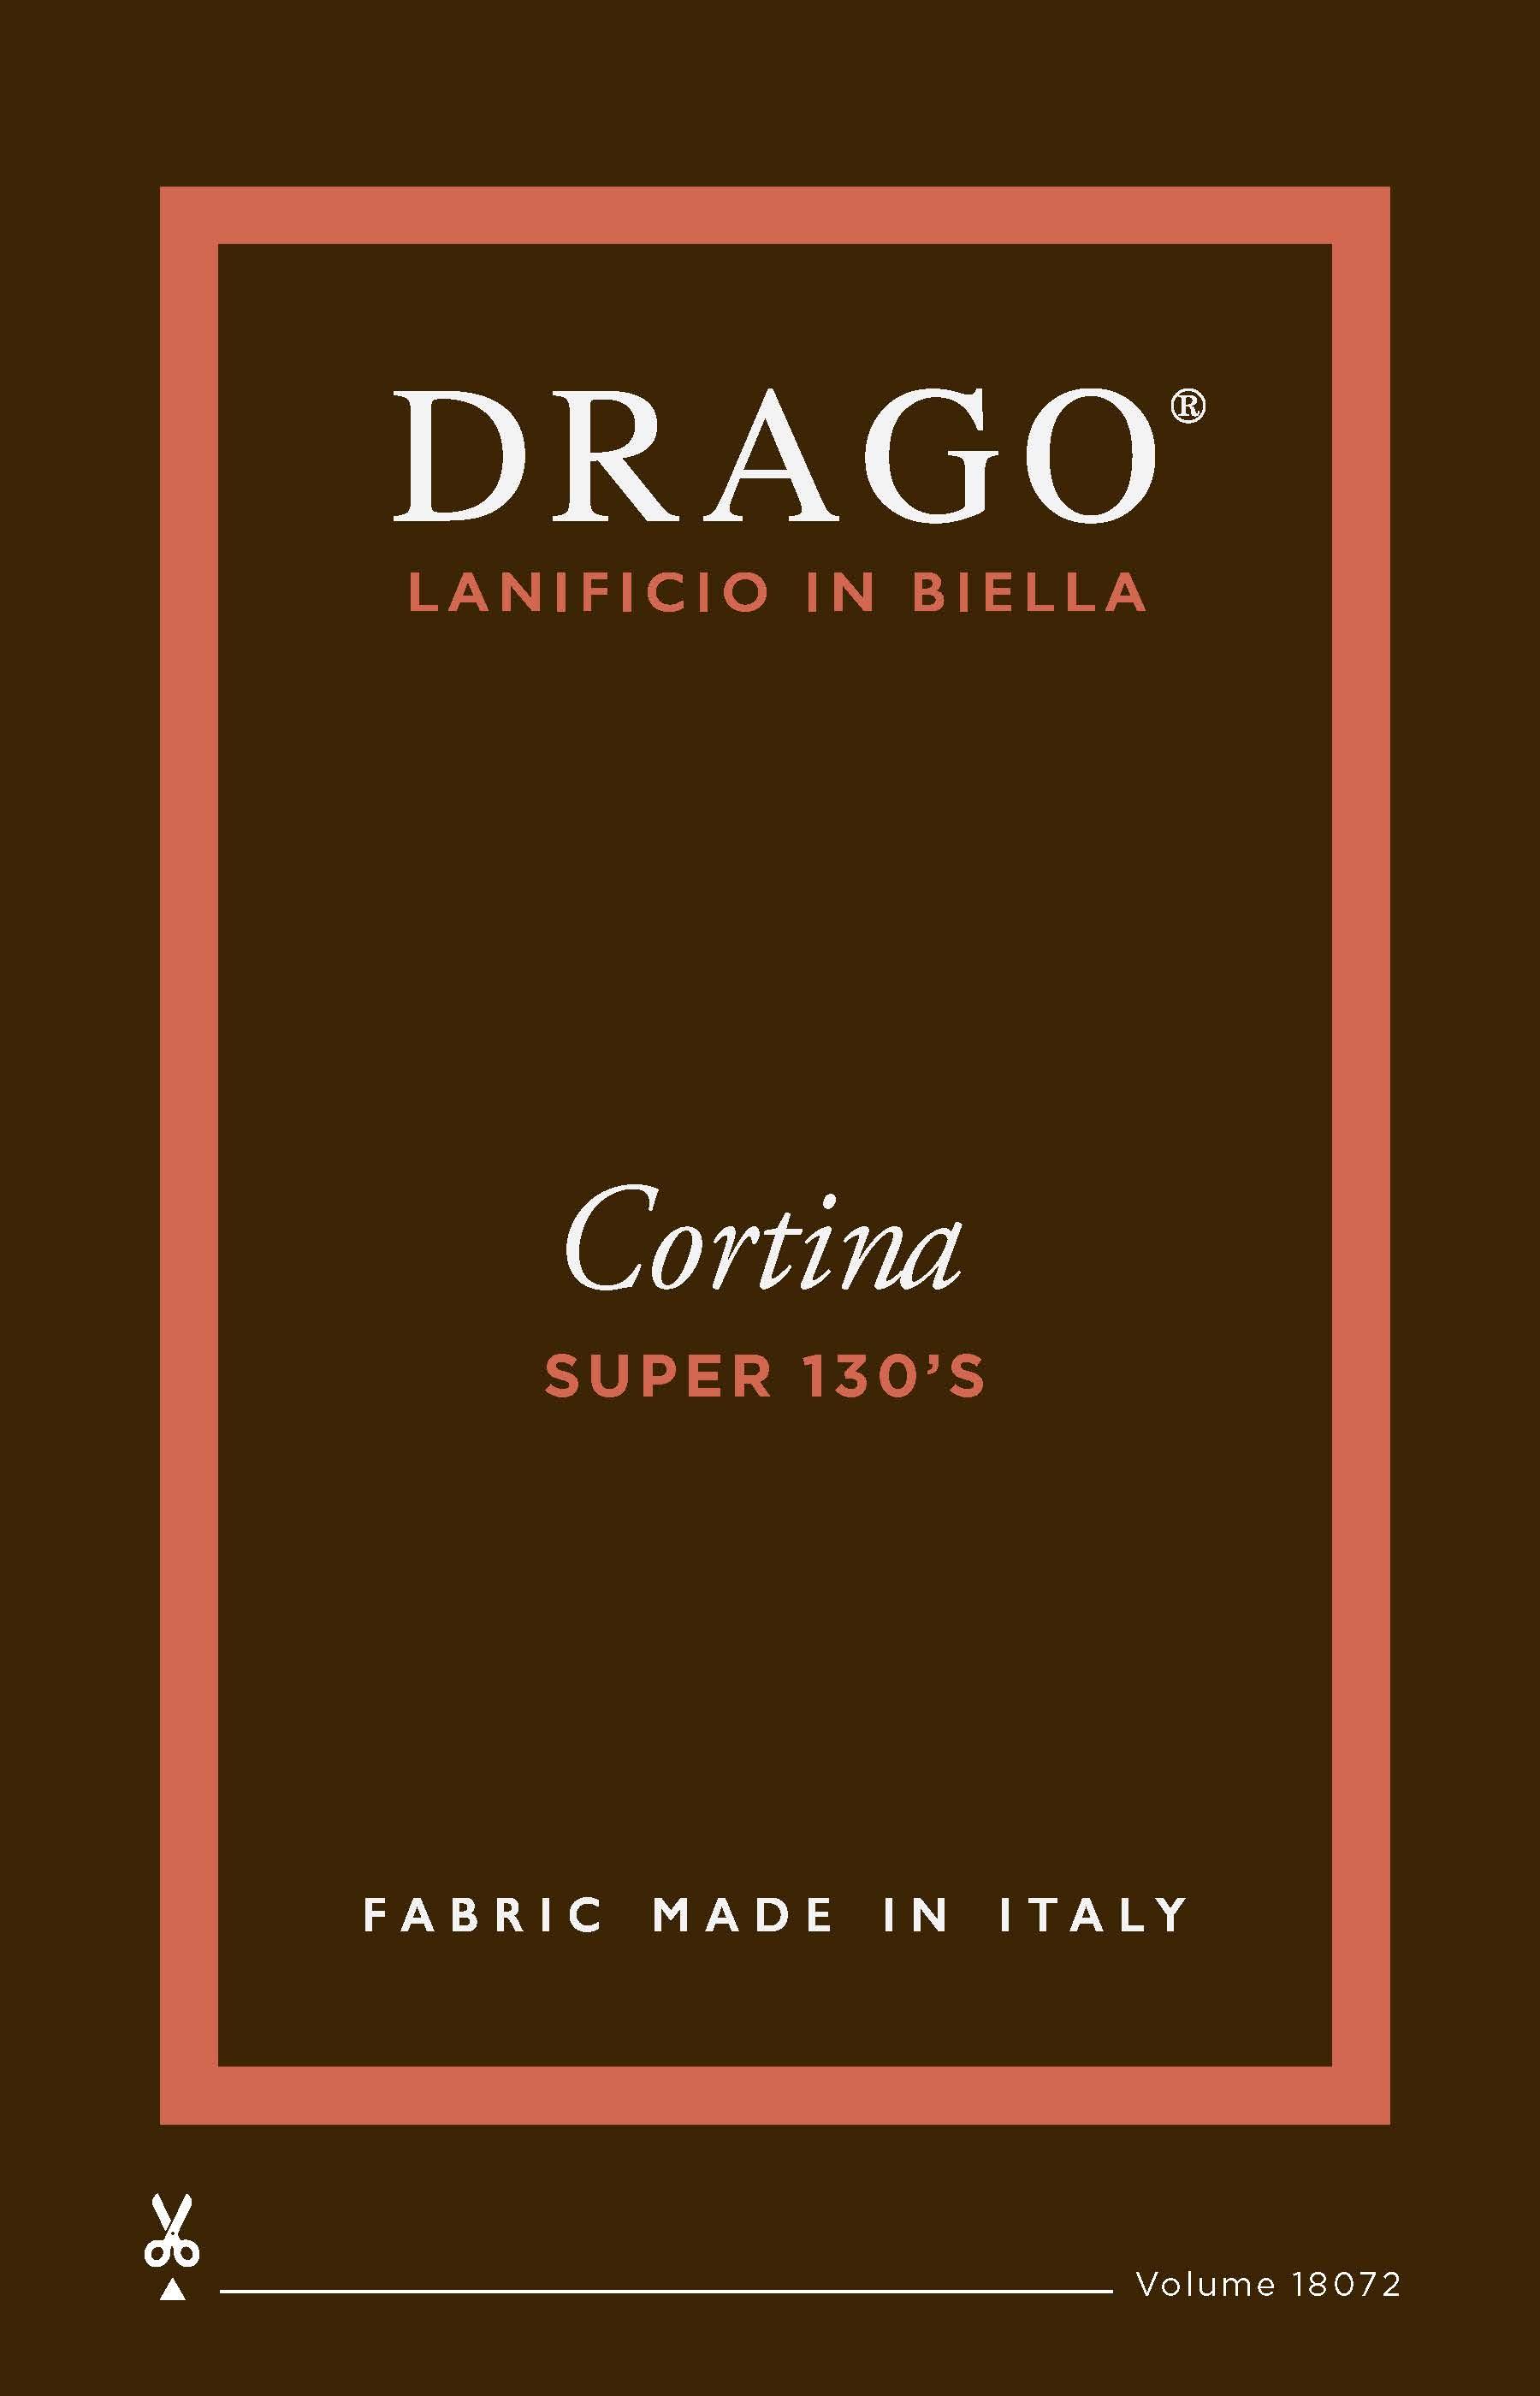 Drago_Cortina_V18072_DIGITAL.jpg